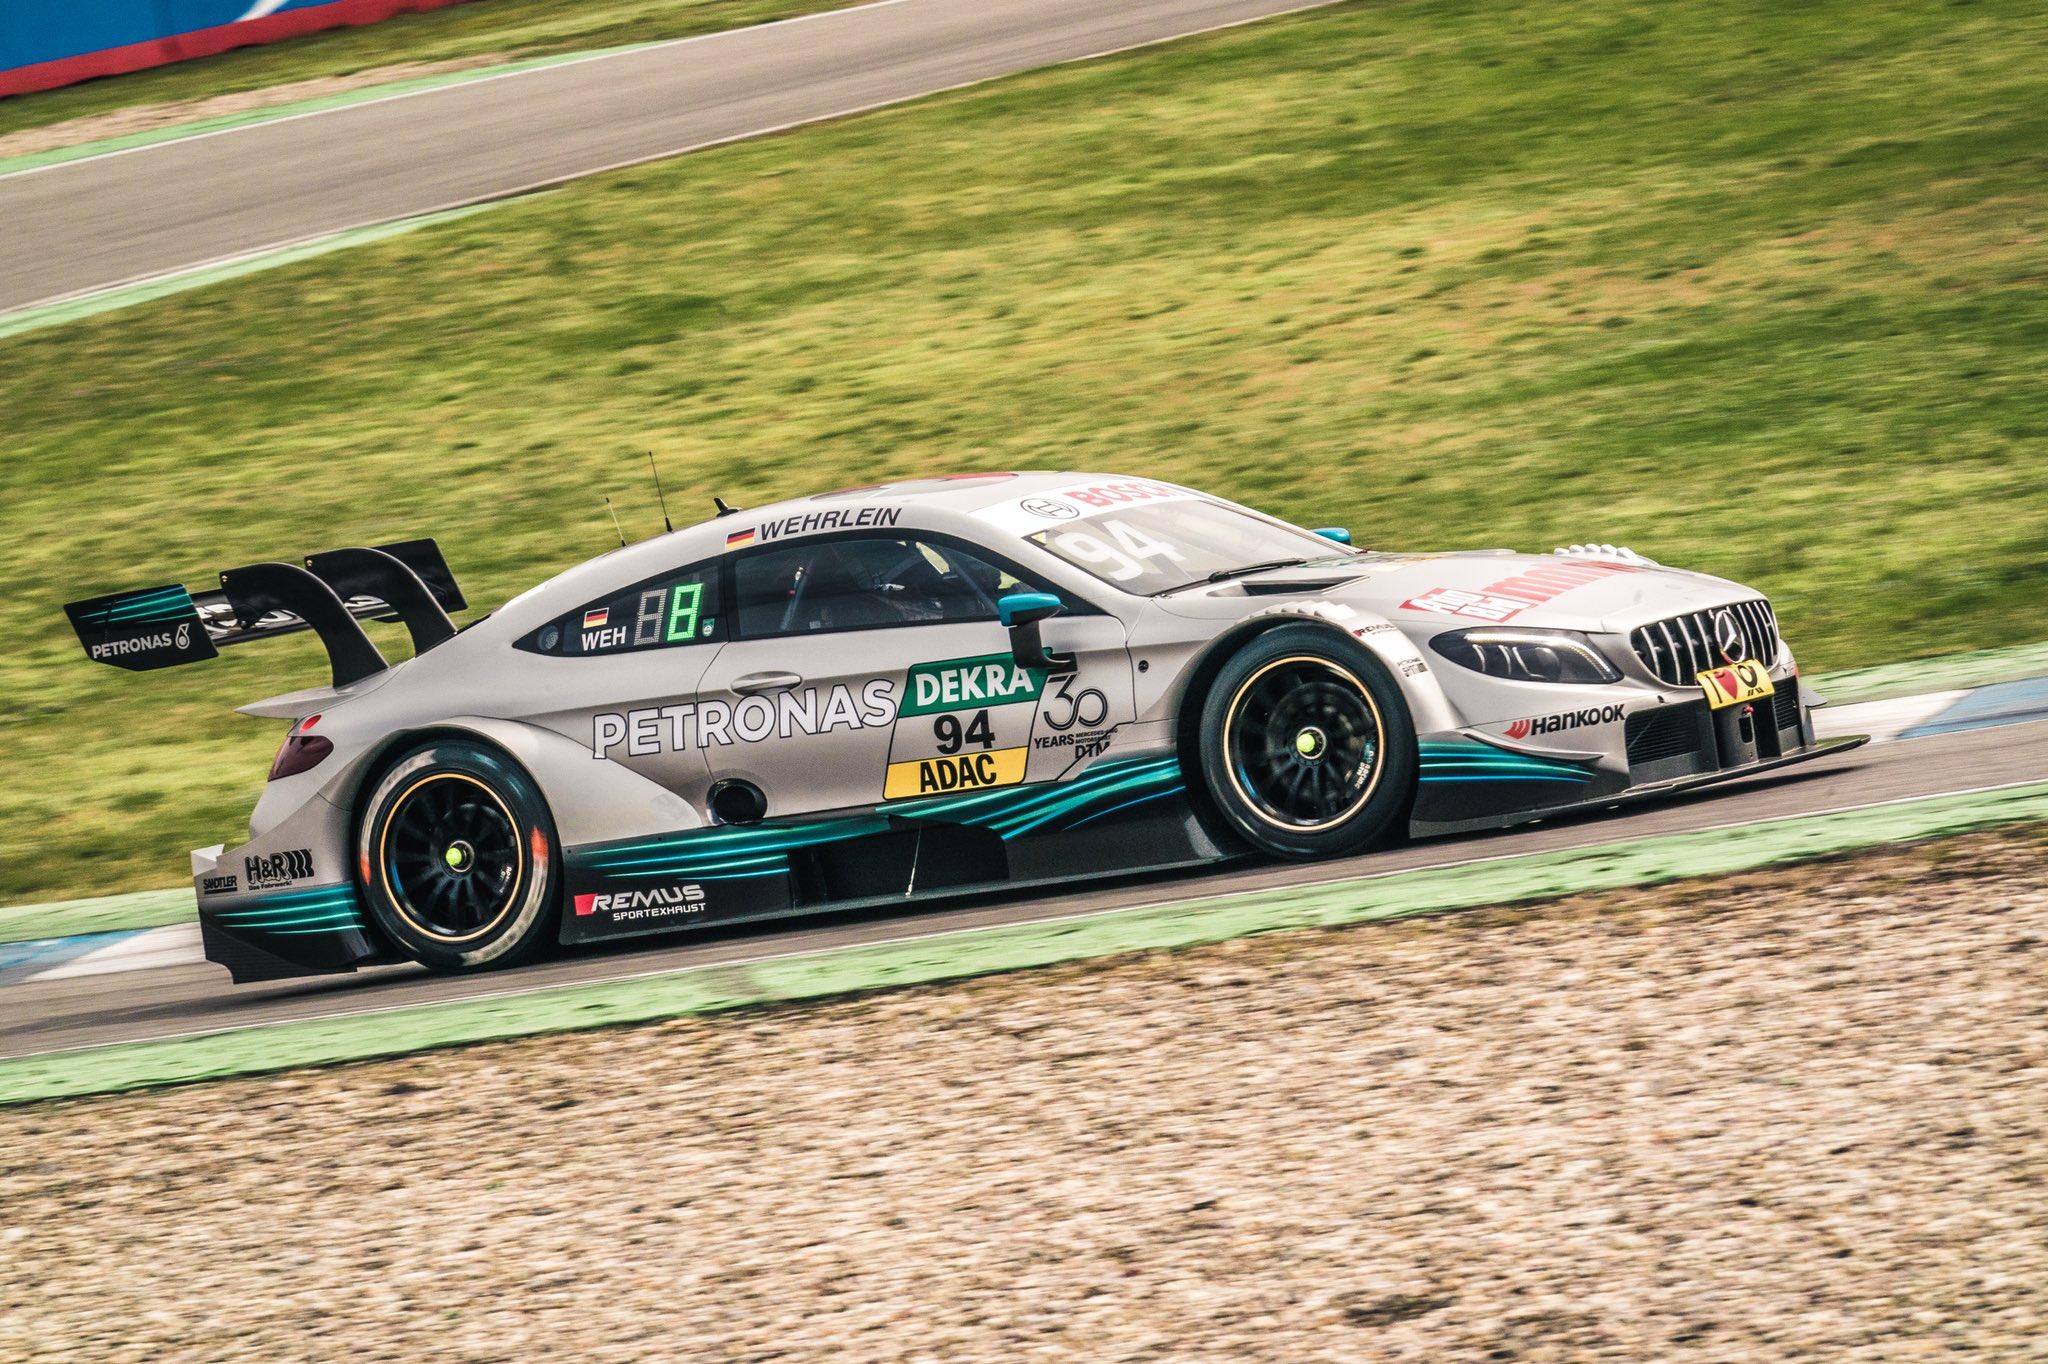 2018 DTM Mercedes Pascal Wehrlein